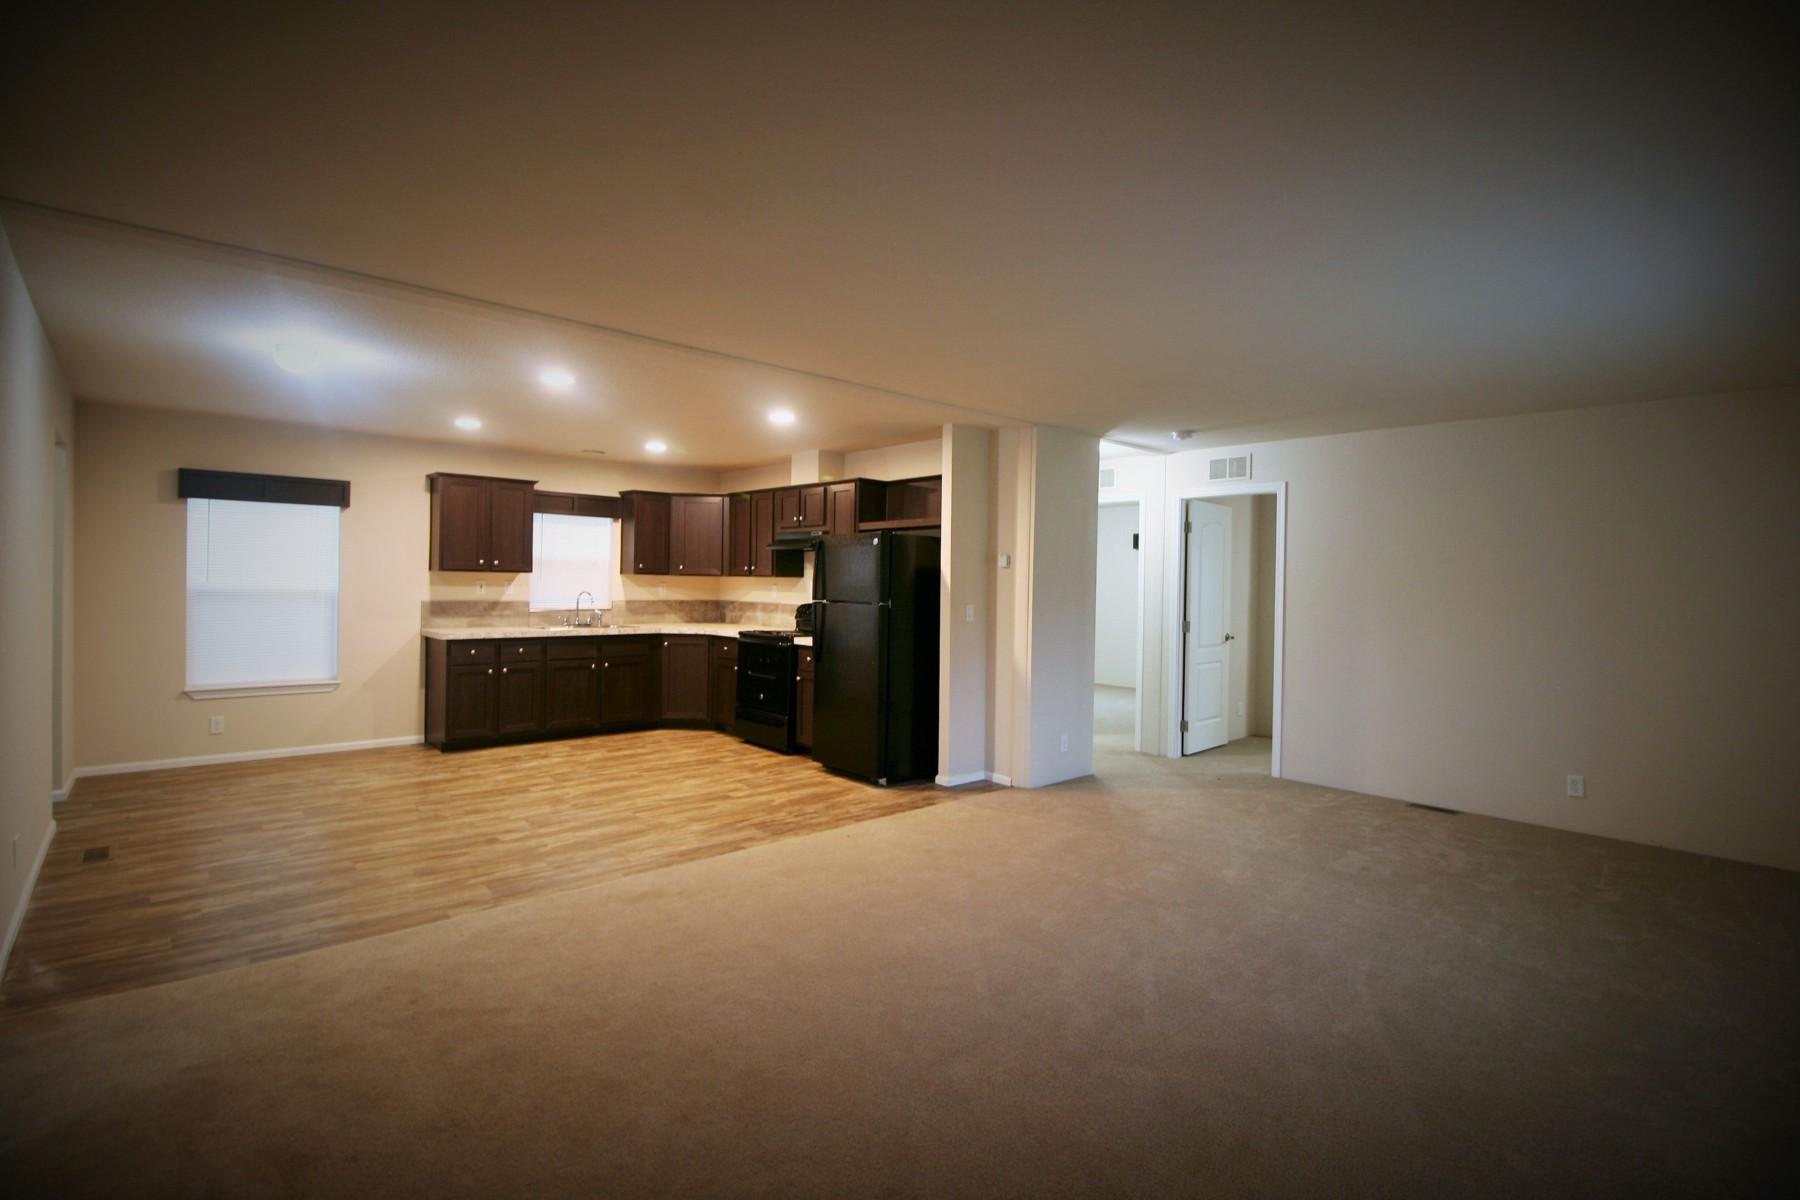 Kitchen.Living room 02.15.18